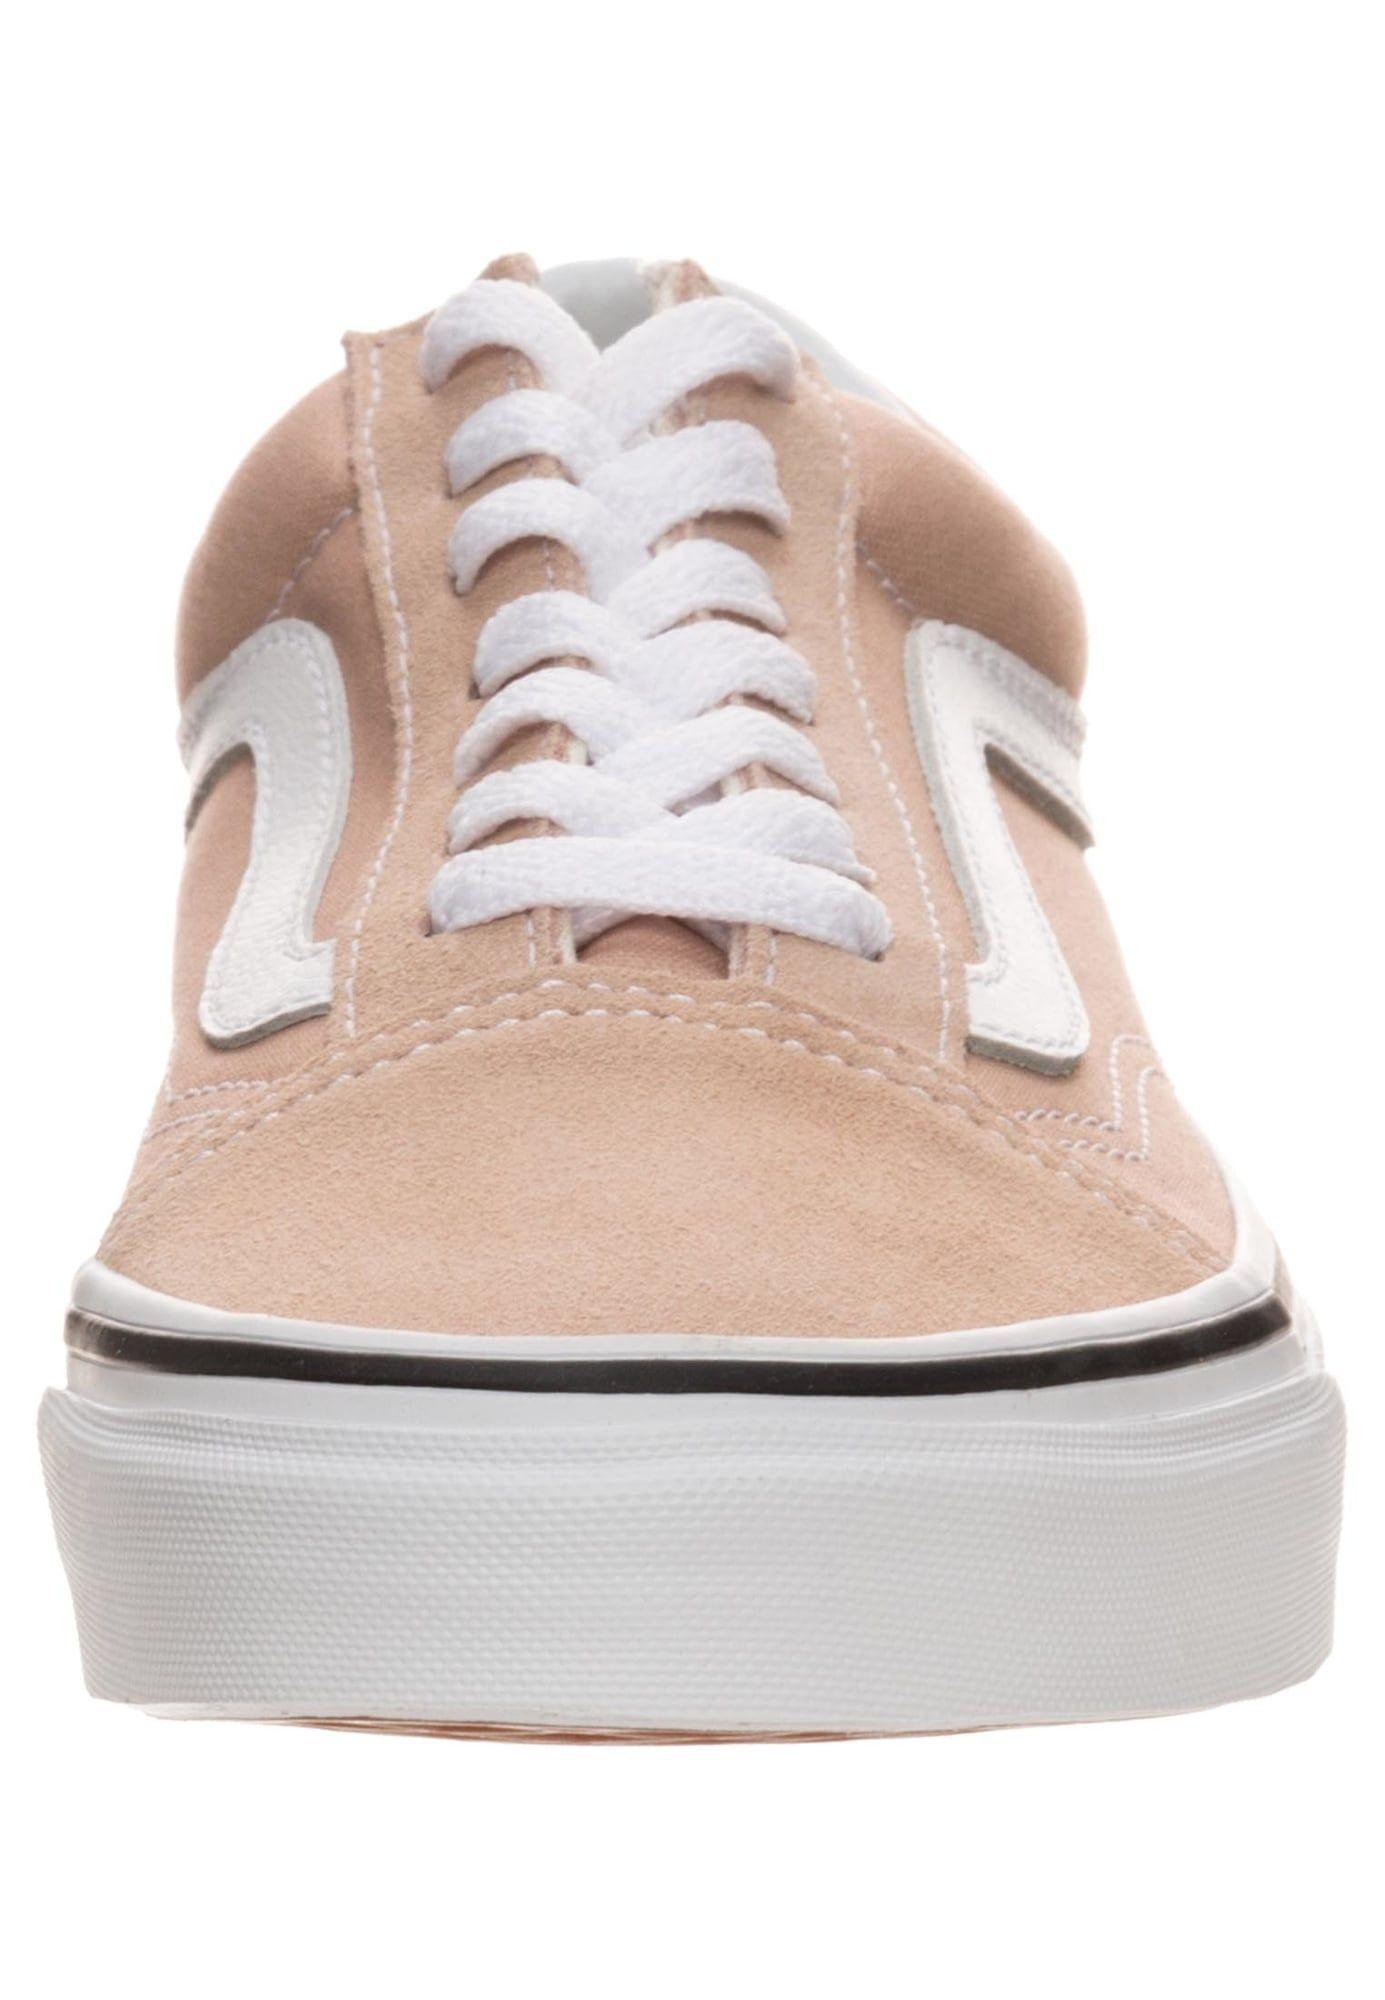 Vans Sneaker Old Skool Damen Altrosa Weiss Grosse 40 Sneaker Vans